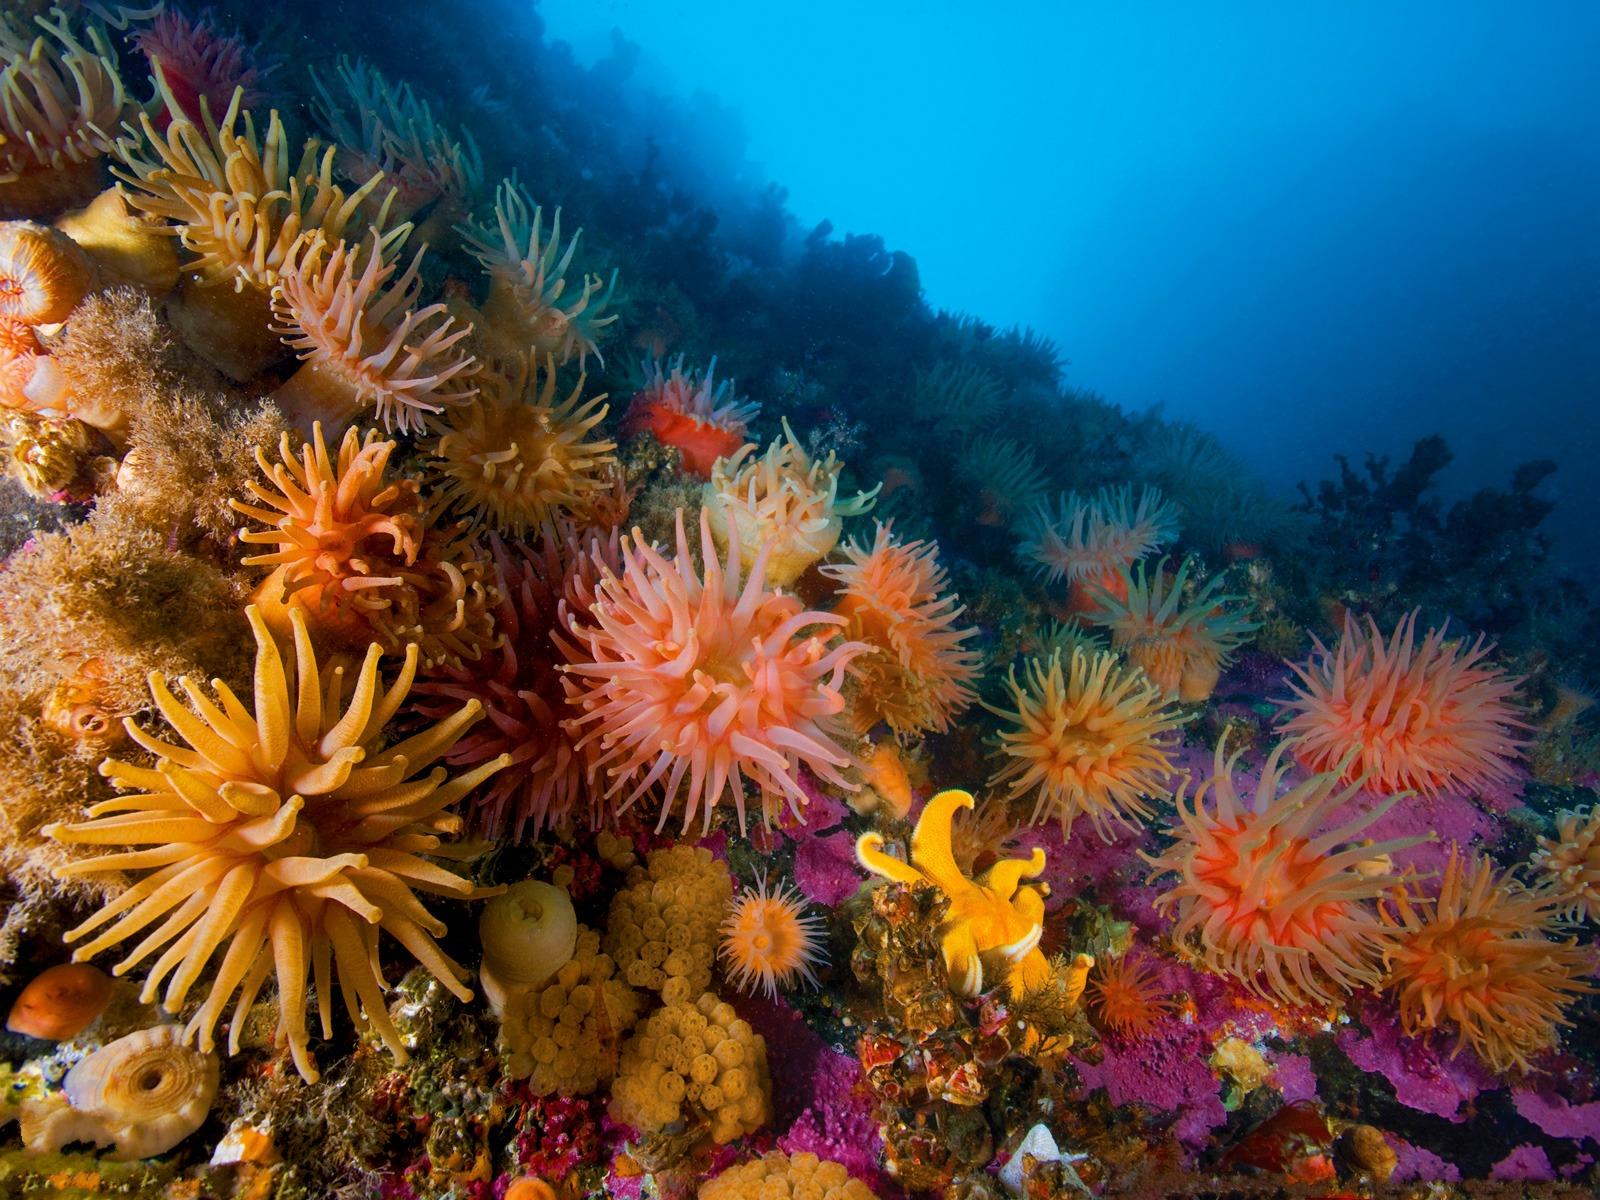 Underwater ocean sea anemones reef coral wallpaper 1600x1200 34839 1600x1200